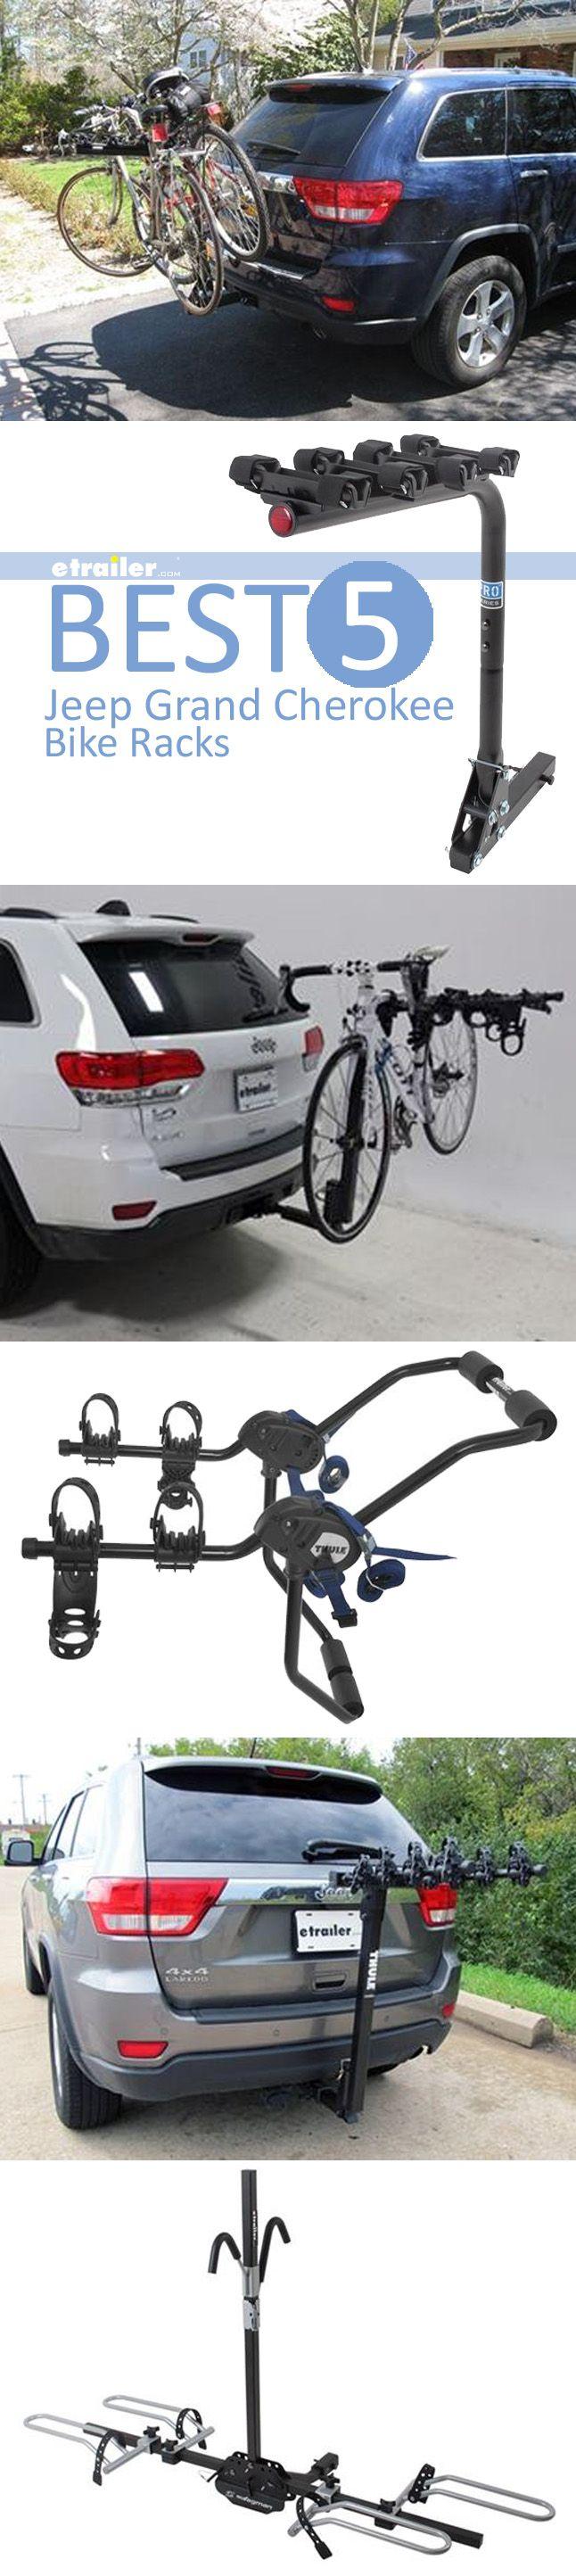 Best 5 jeep grand cherokee bike racks swinging tilting platform hitch mounted